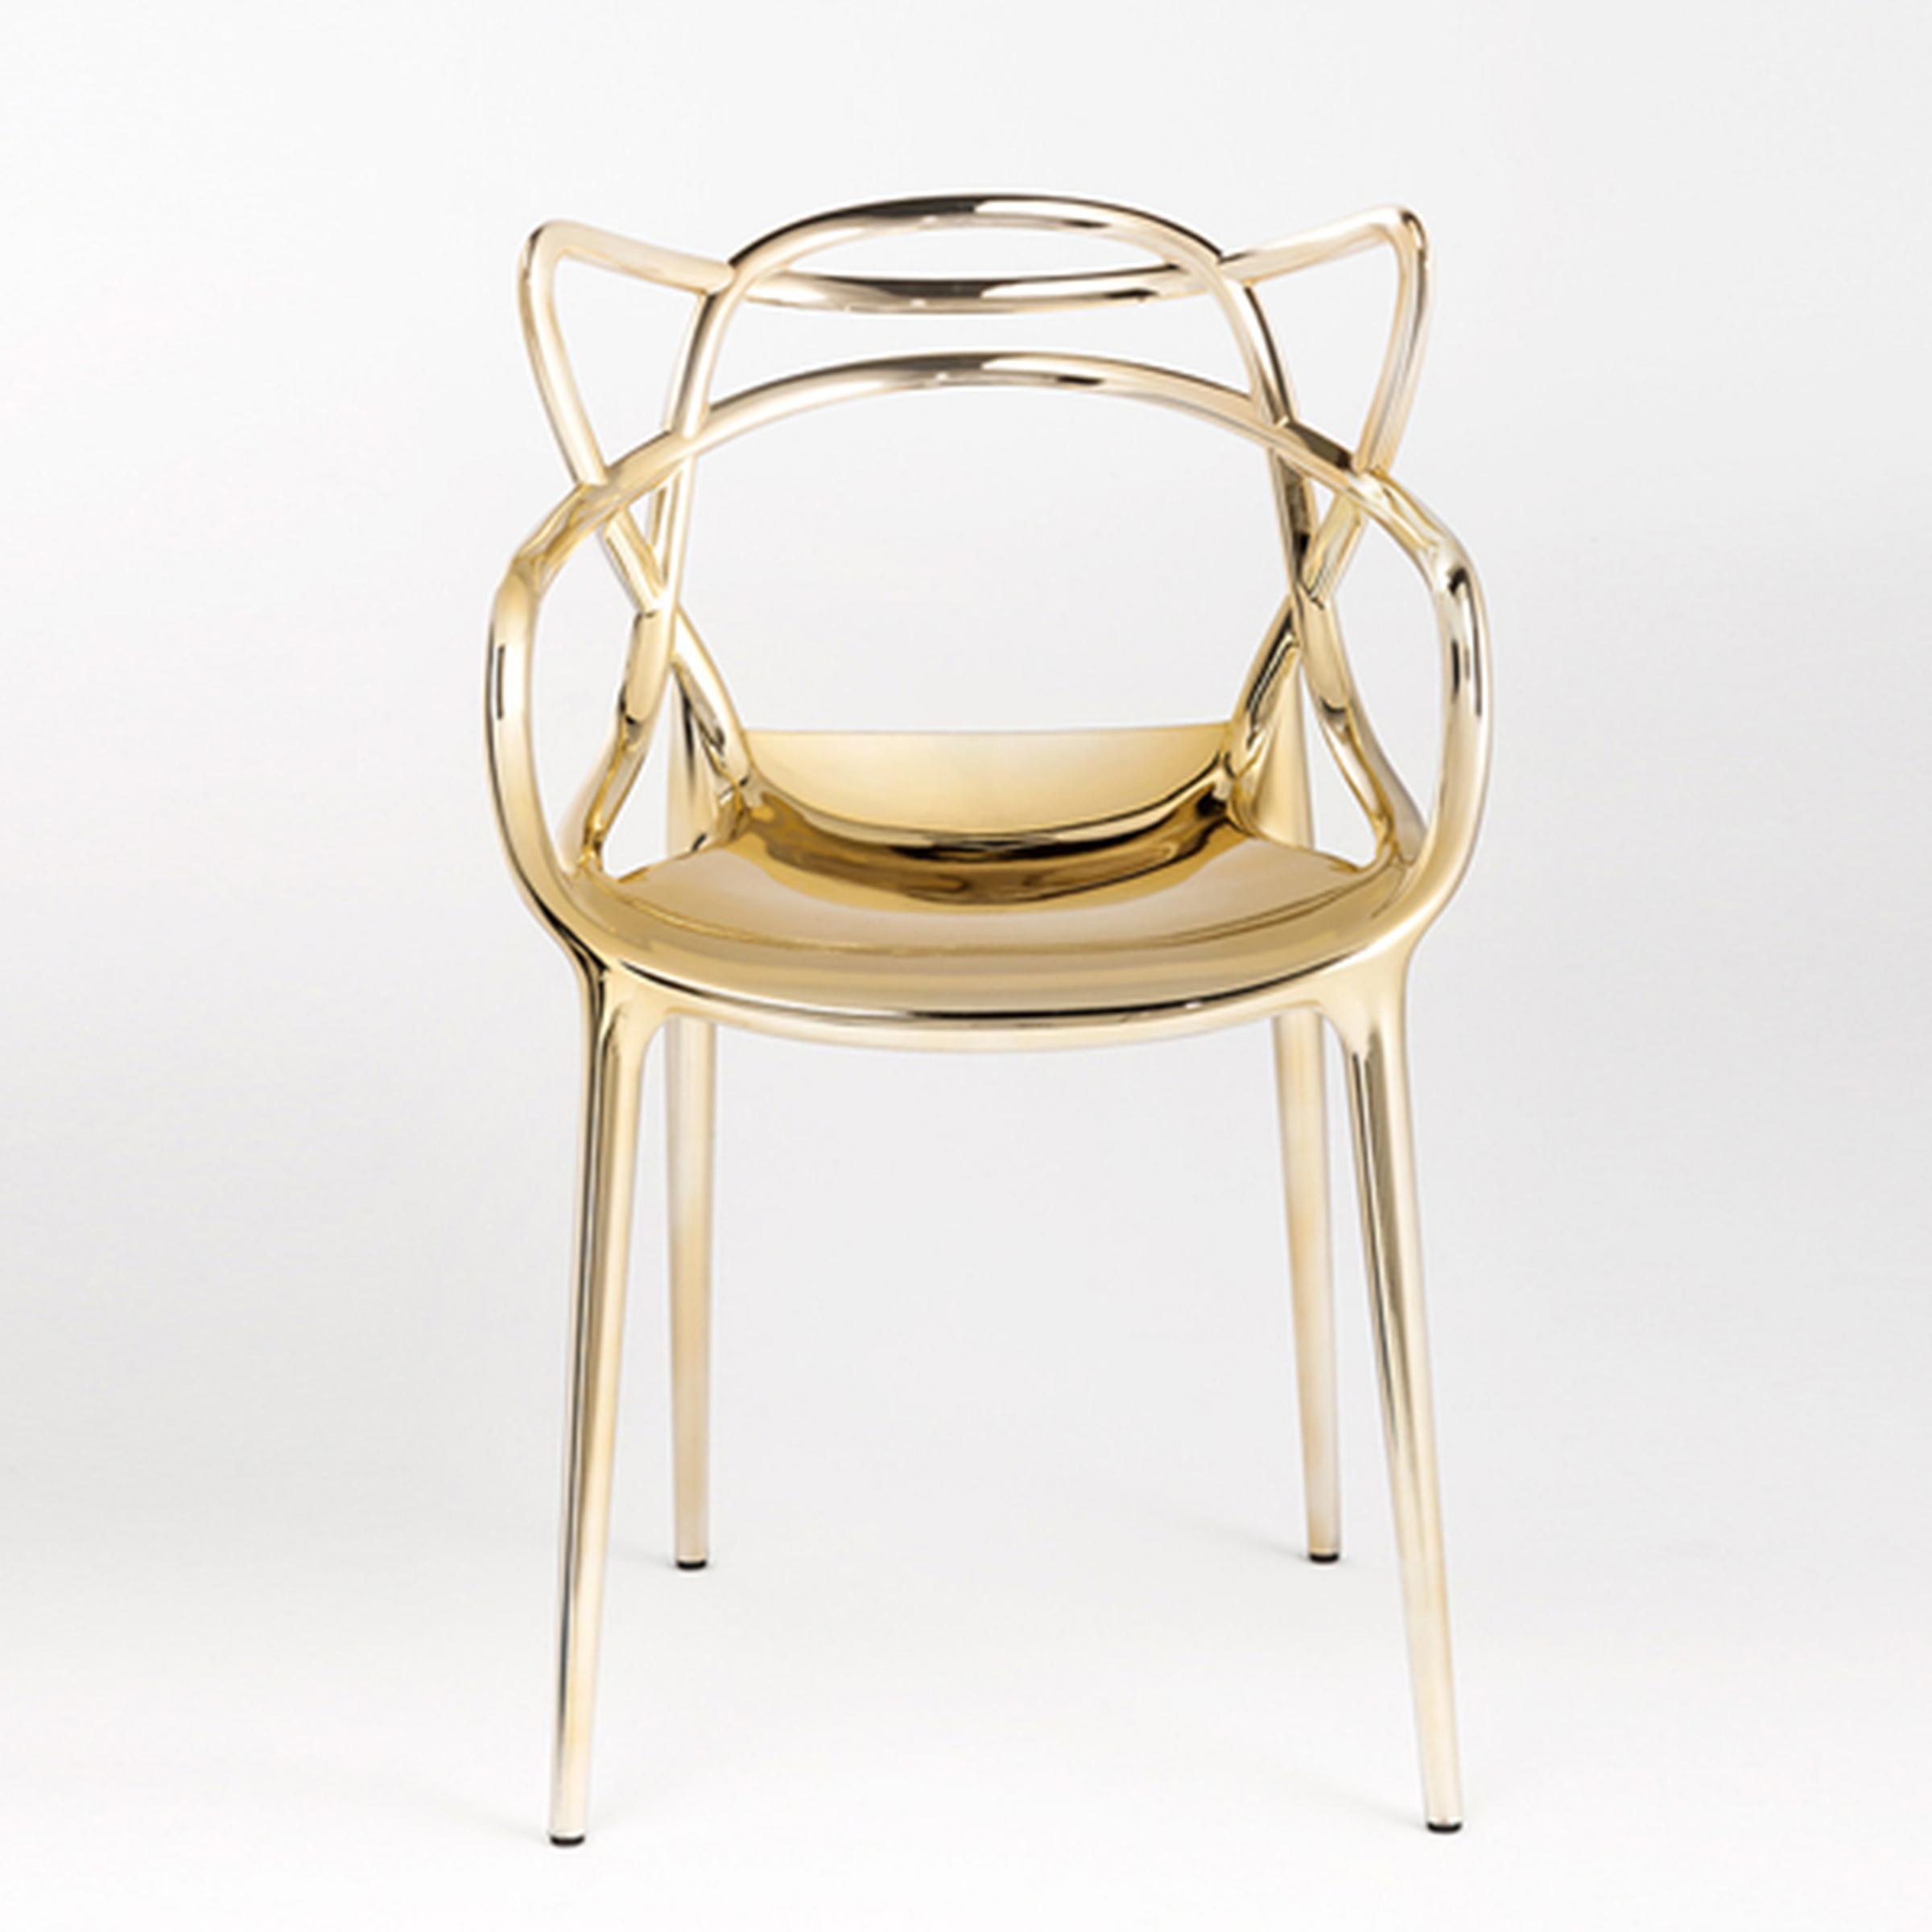 DesignApplause | Masters chair. Philippe starck.